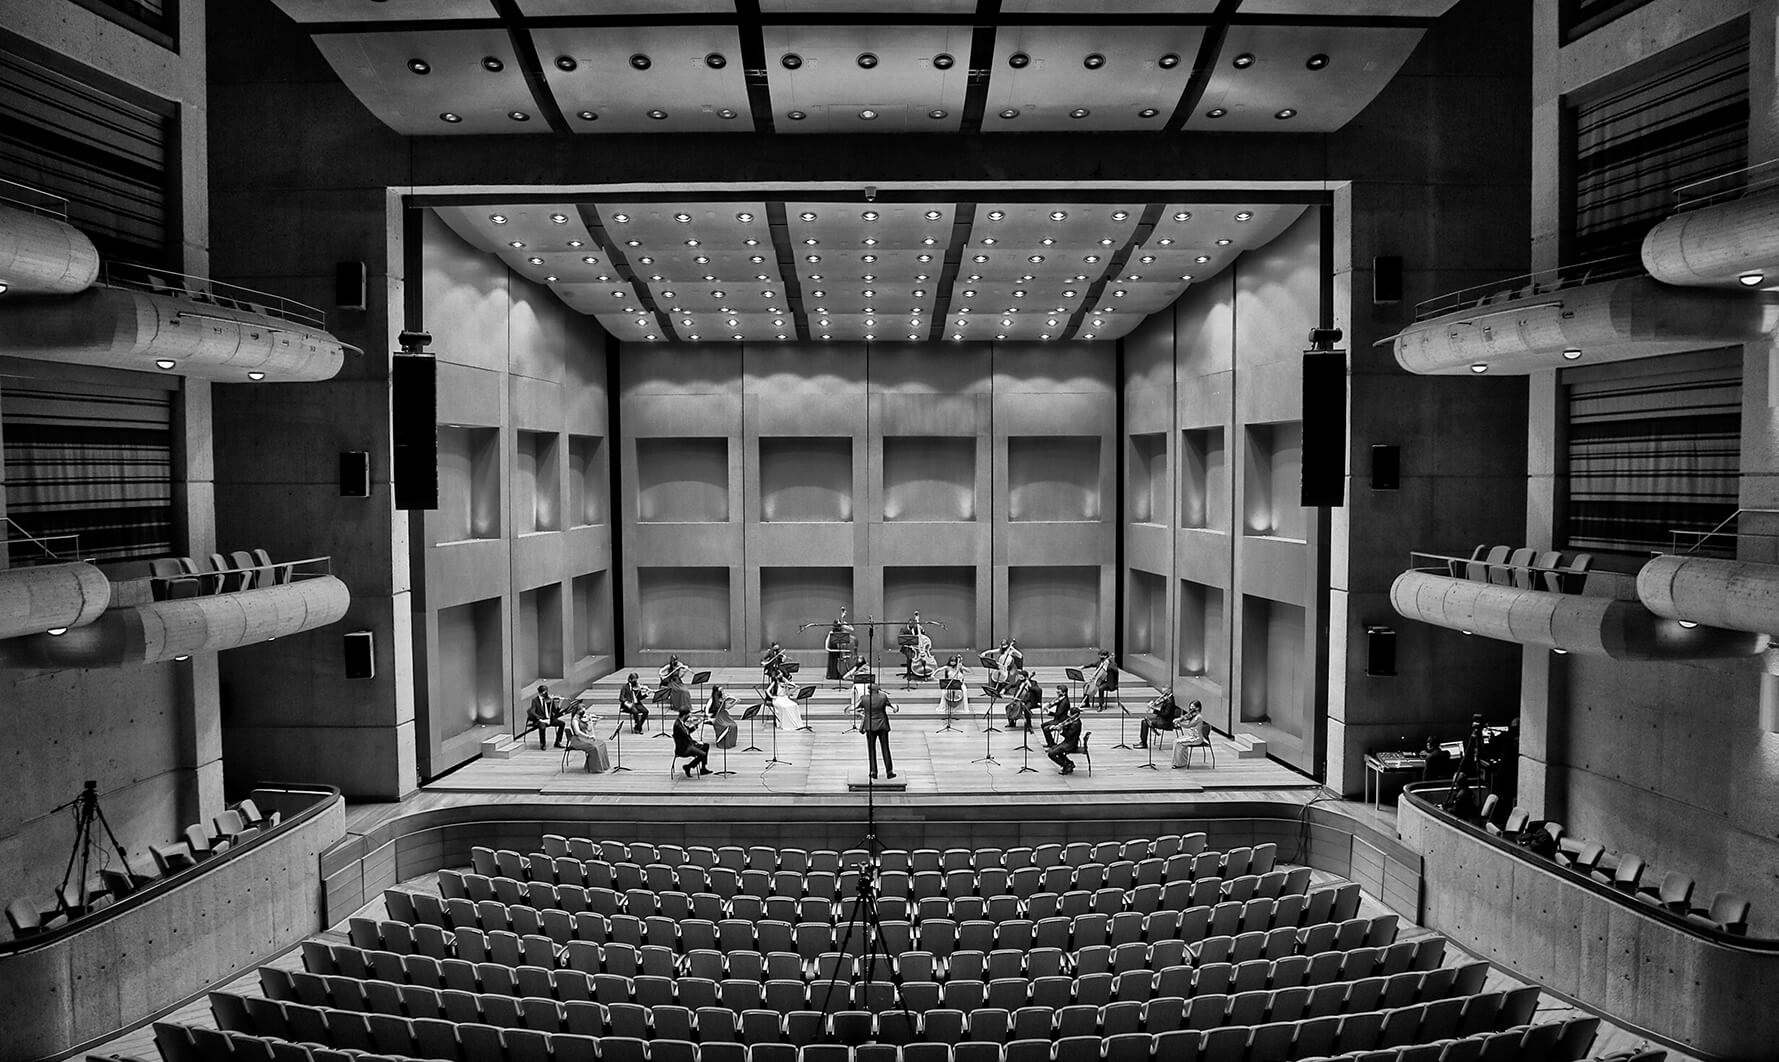 Orquestas Juveniles - Orquesta Filarmónica de Bogotá